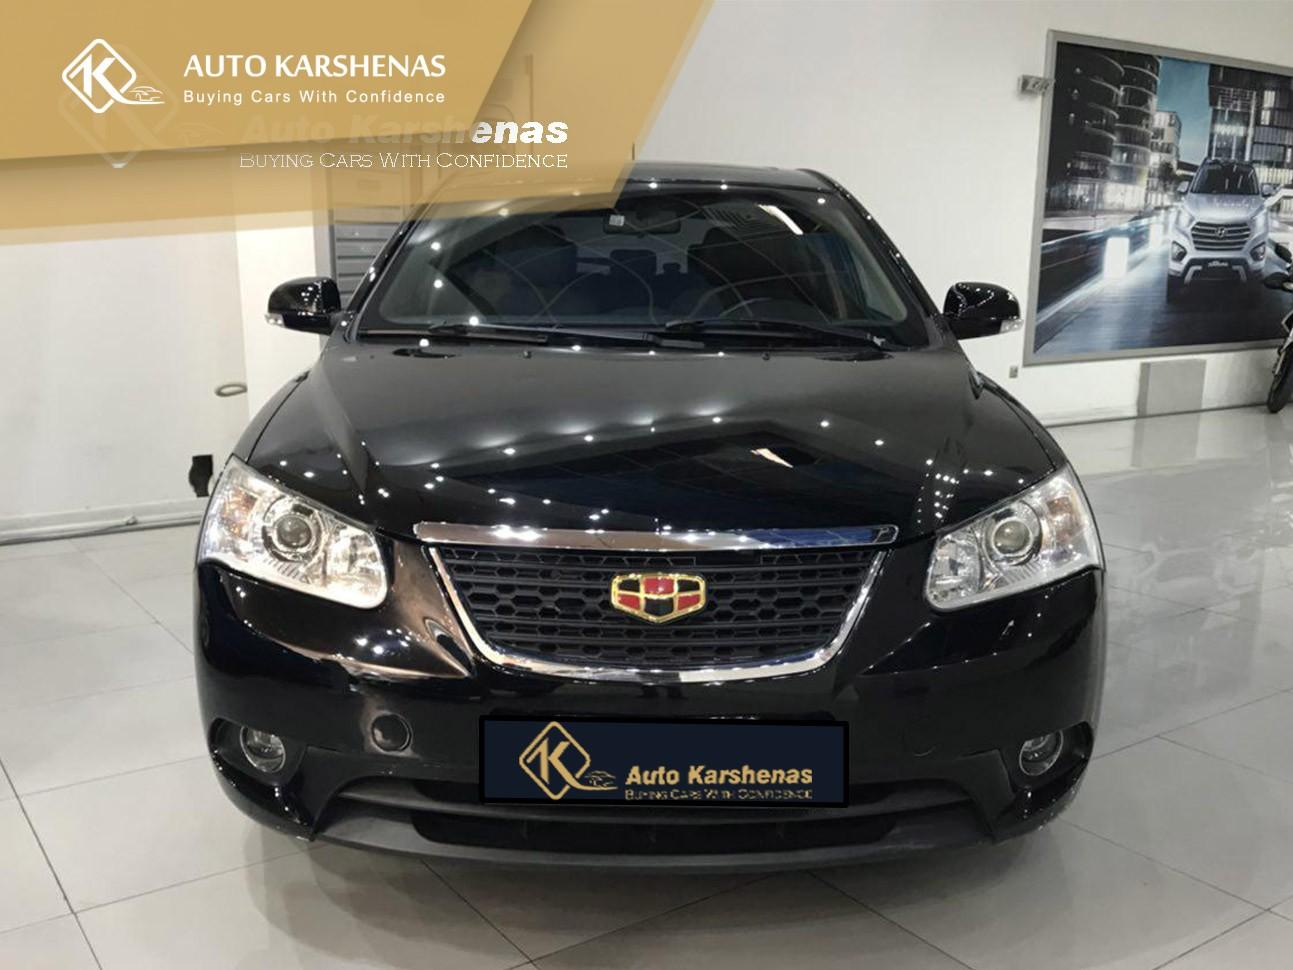 خرید خودرو جیلی امگرند هاچ بک 7 - 2015-اتوکارشناس (4)